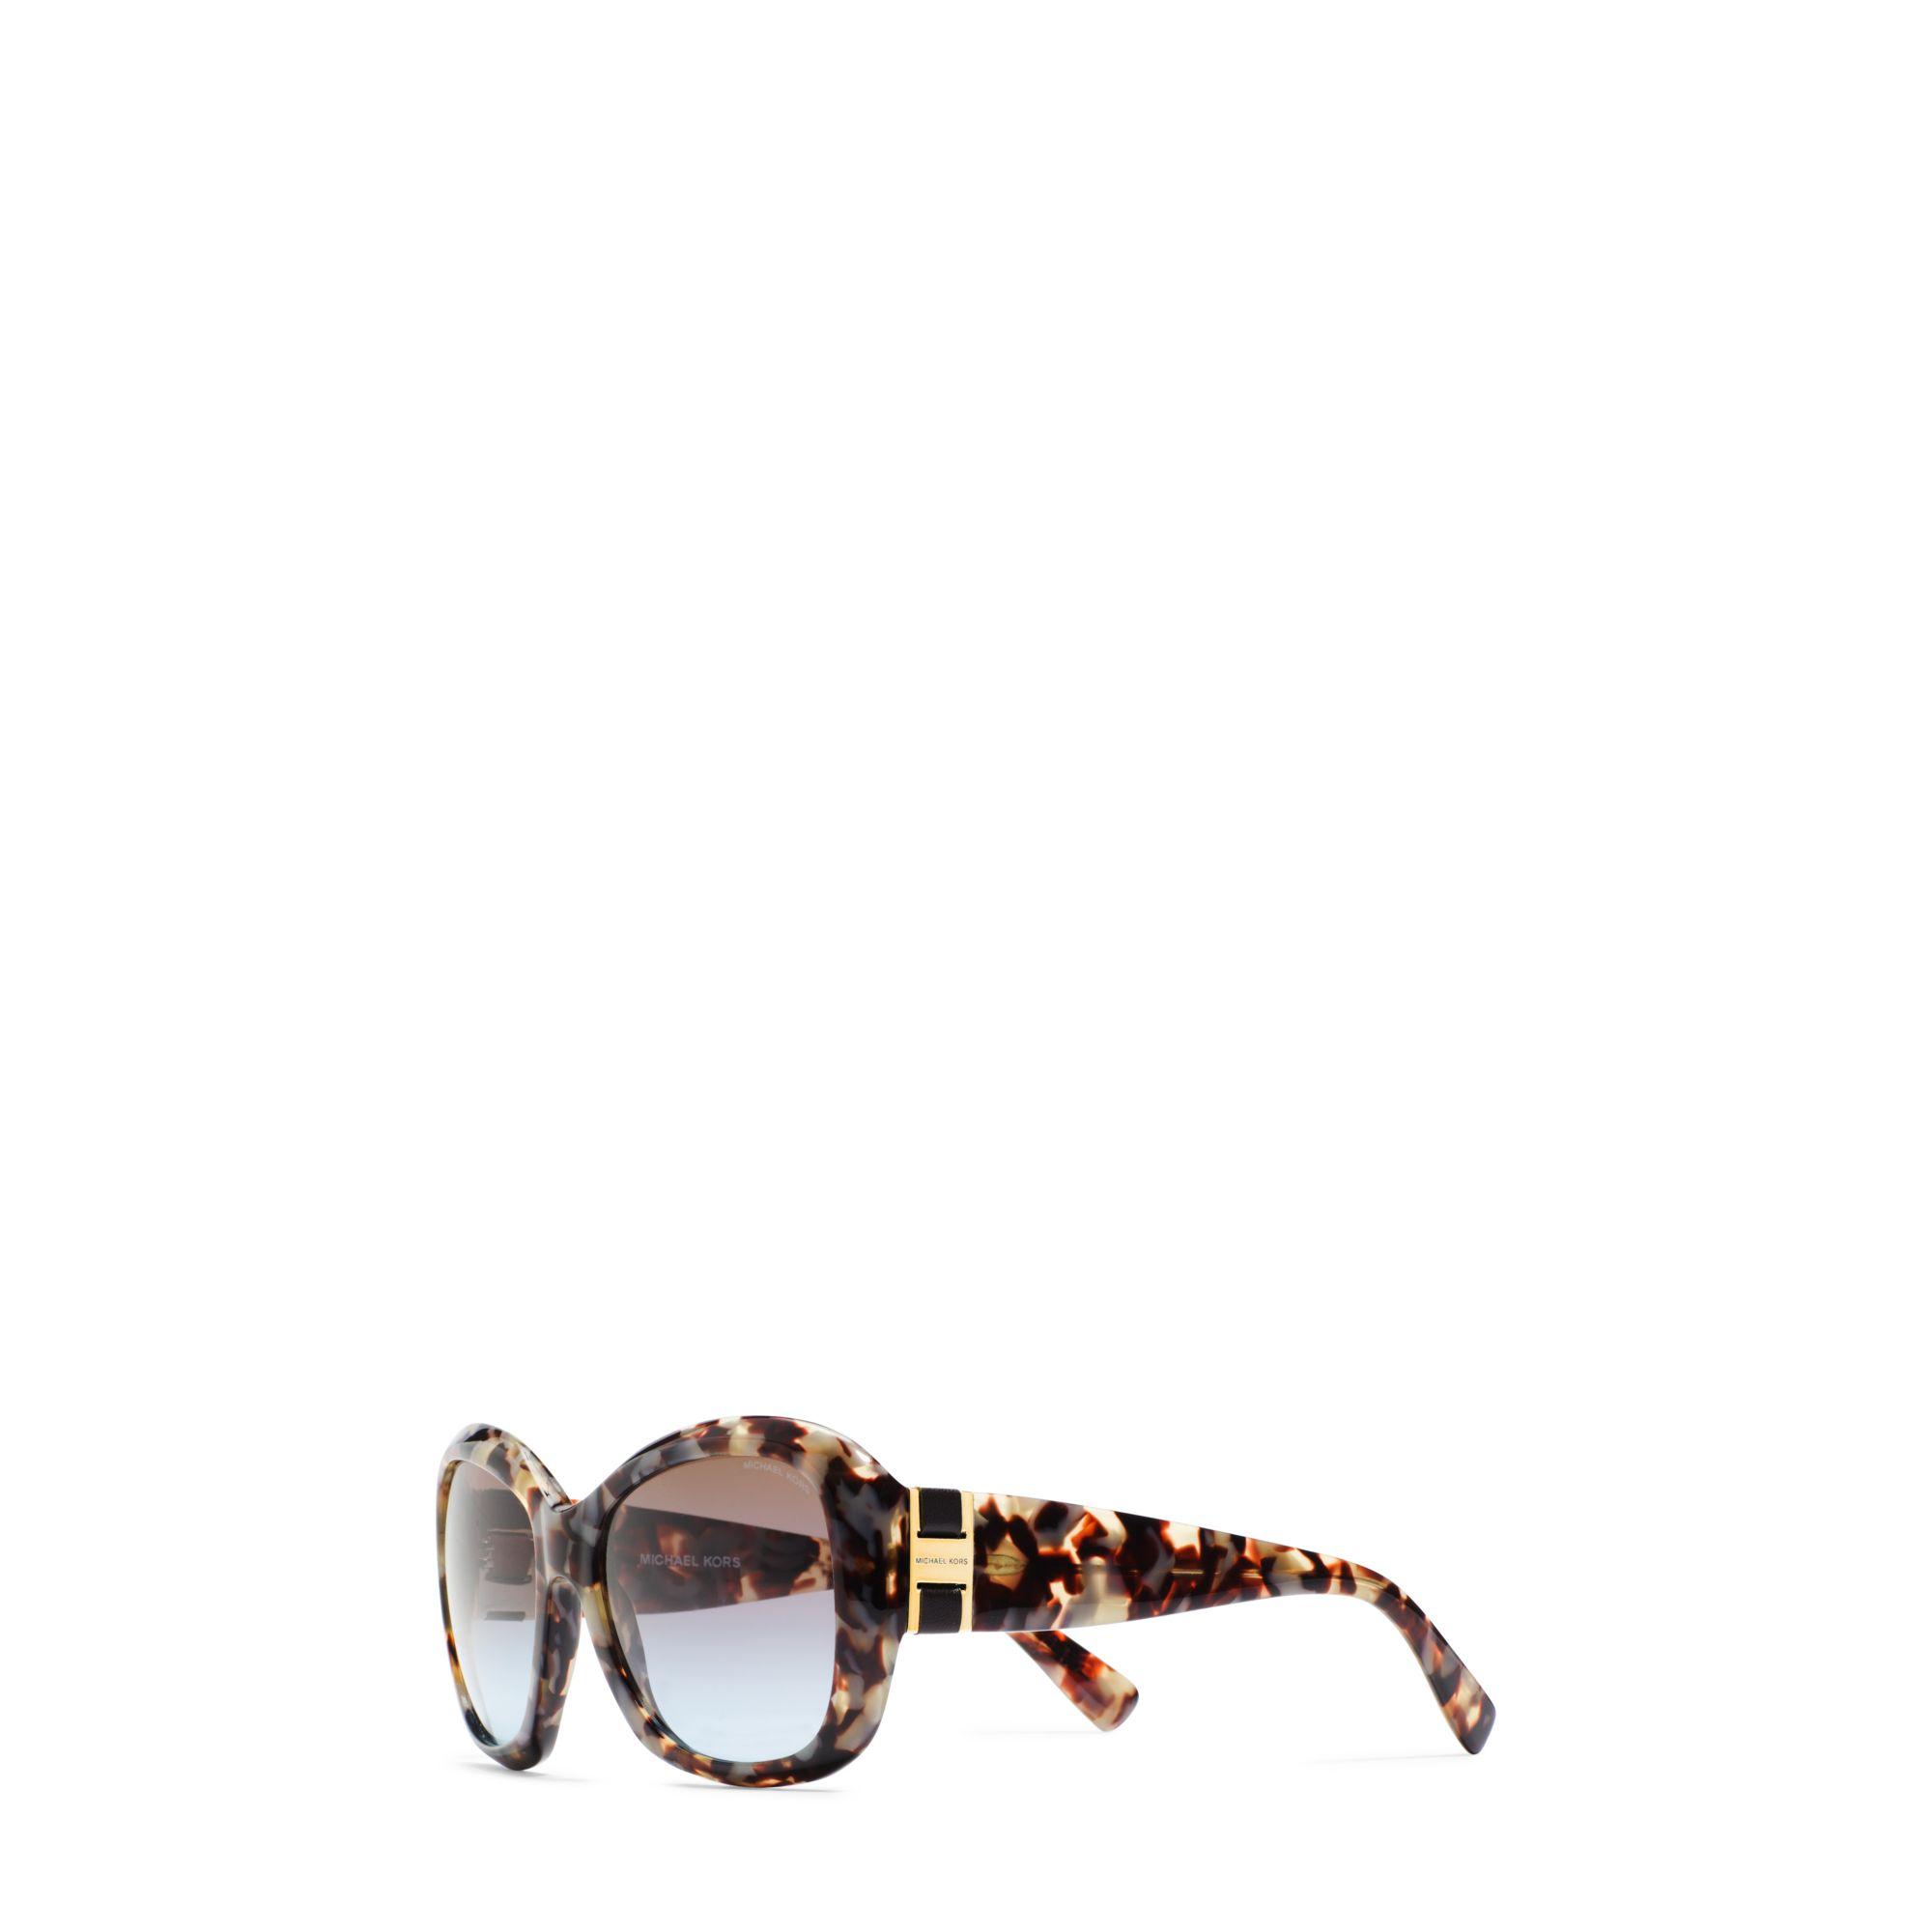 ede63afb2e Michael kors Miranda Collection panama Sunglasses in Brown